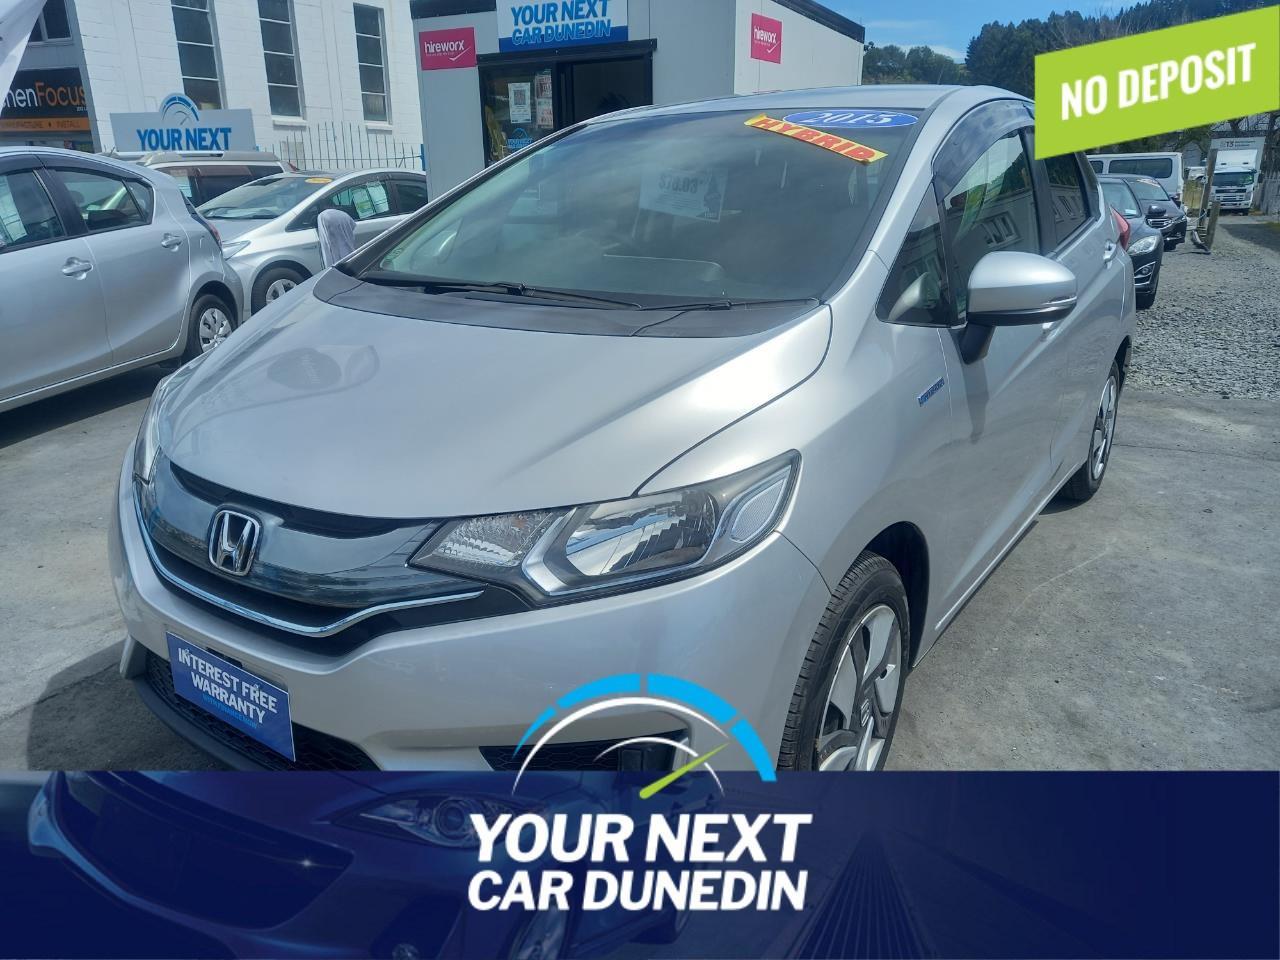 image-0, 2015 Honda Fit Hybrid No Deposit Finance at Dunedin